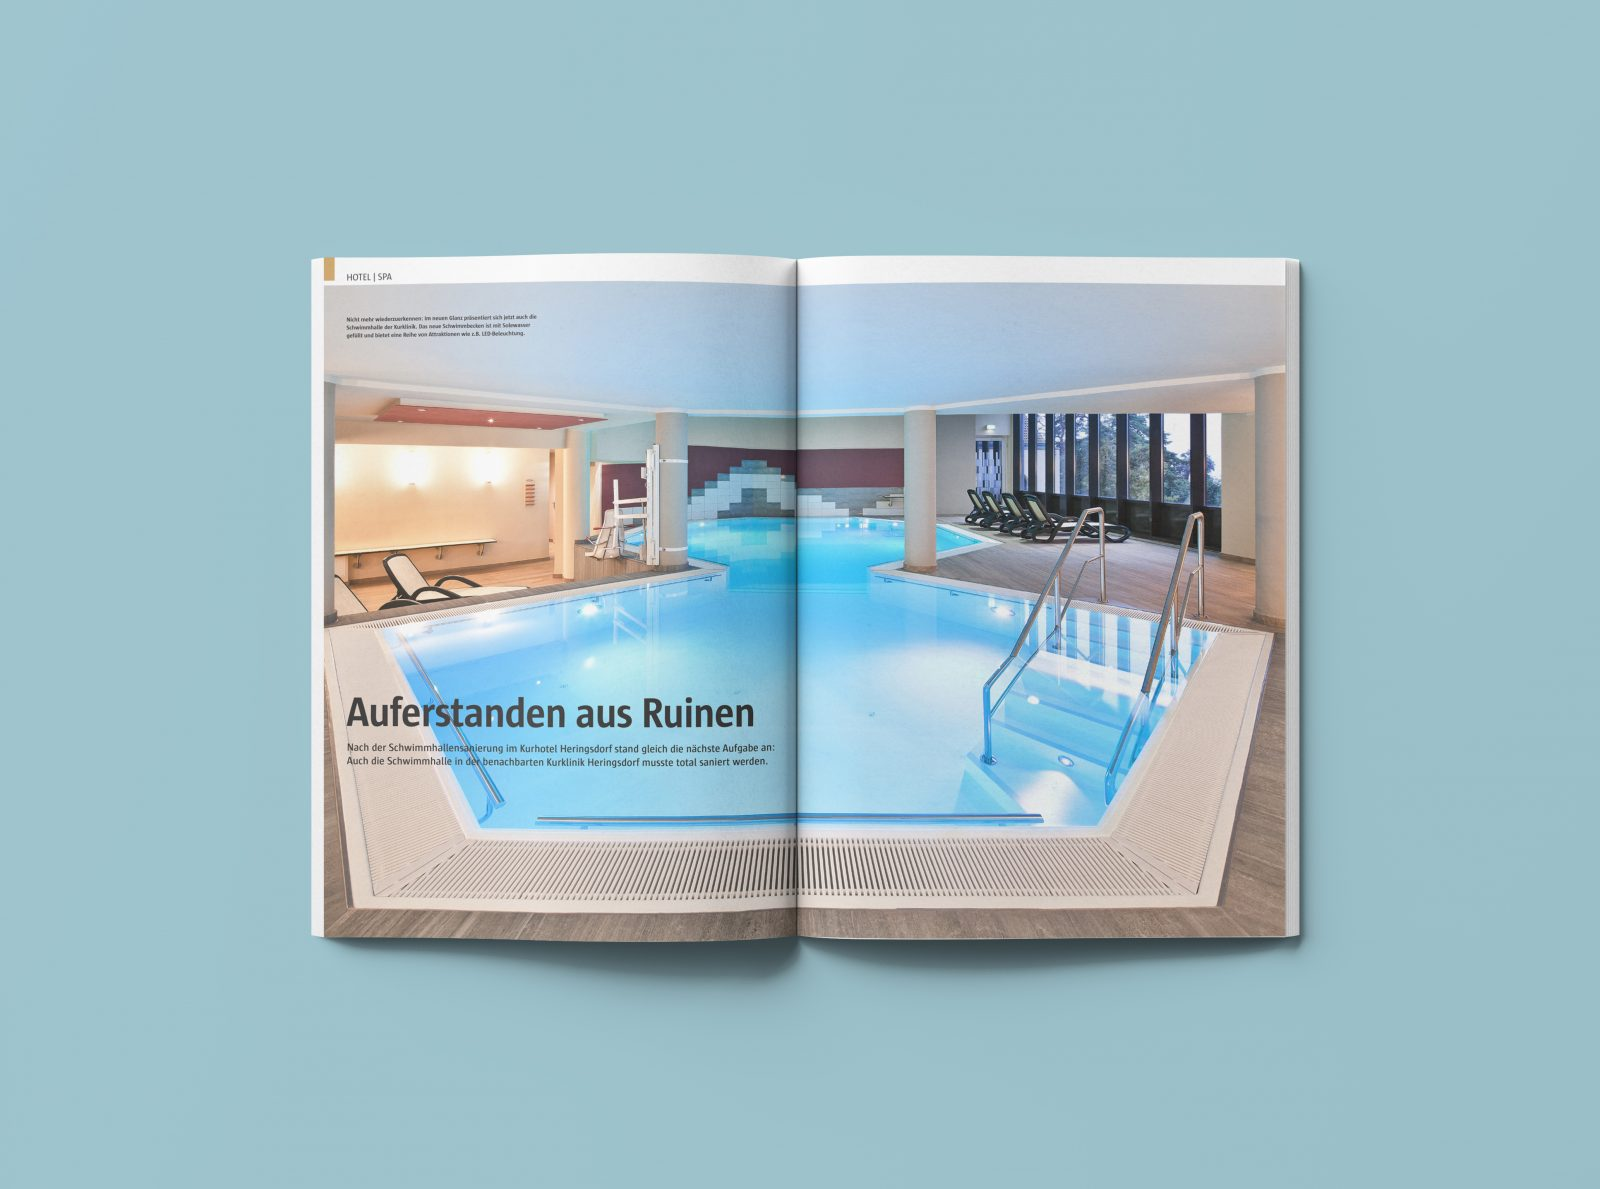 Kurklinik Kurschwimmbad Heringsdorf Ostsee Hütel&Mess Ospa Schwimmbadtechnik